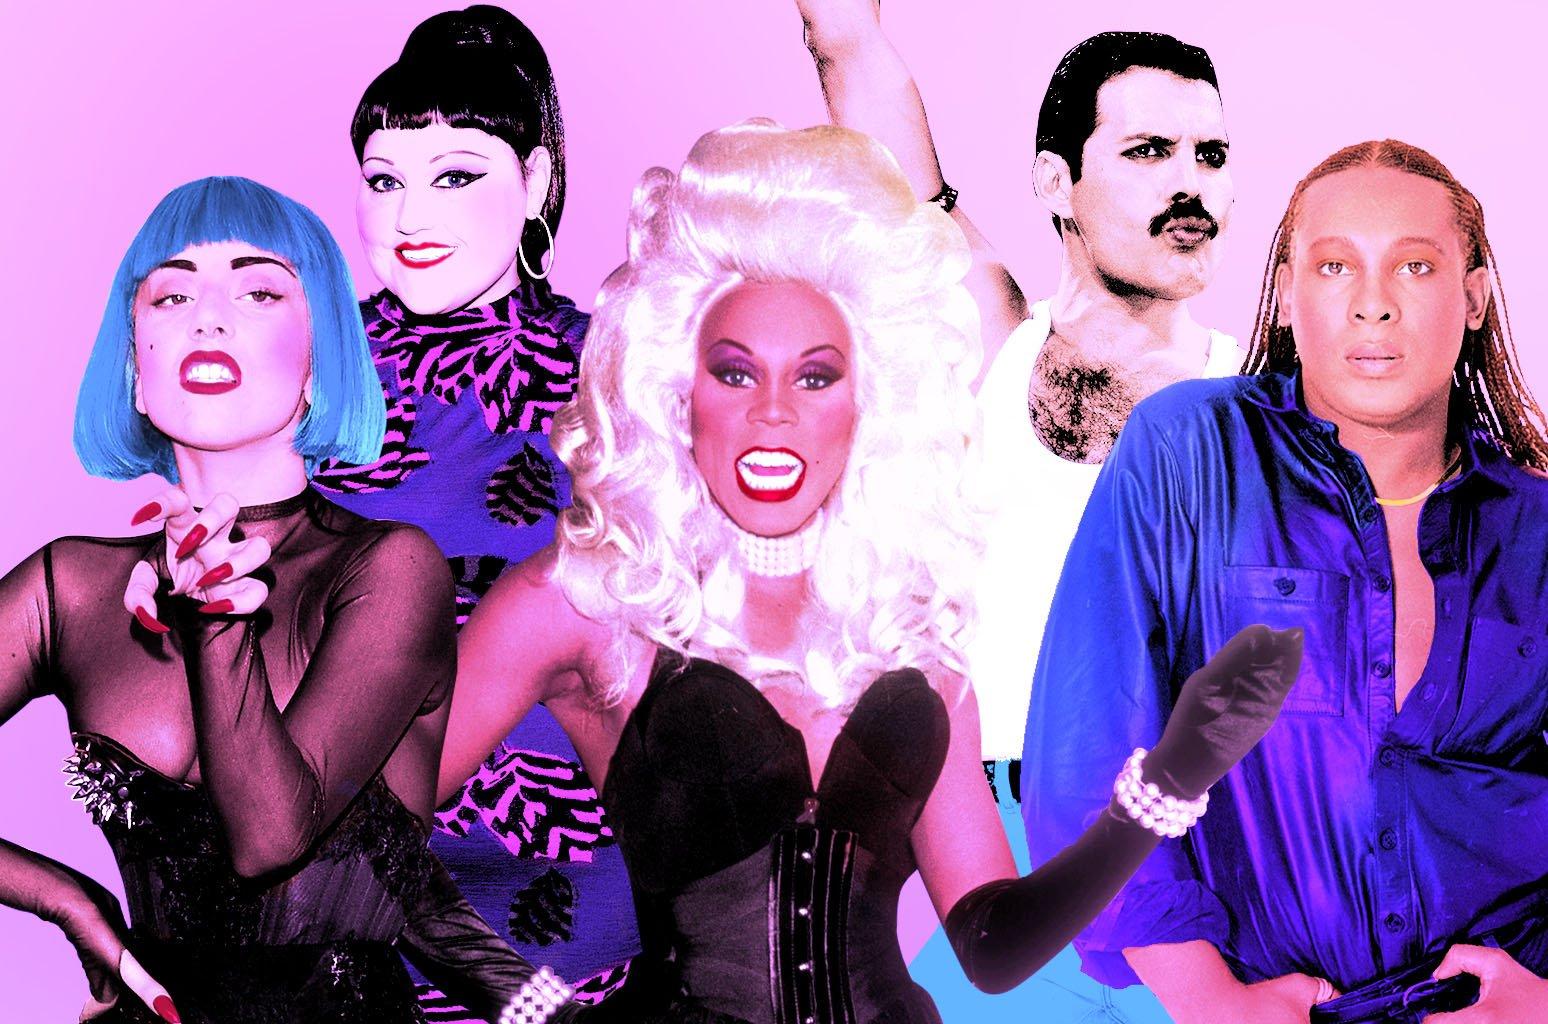 RT @billboard: Celebrate #Pride2016 with 50 gay anthems https://t.co/QPVKtBRGig https://t.co/xa3nD5dn9Q